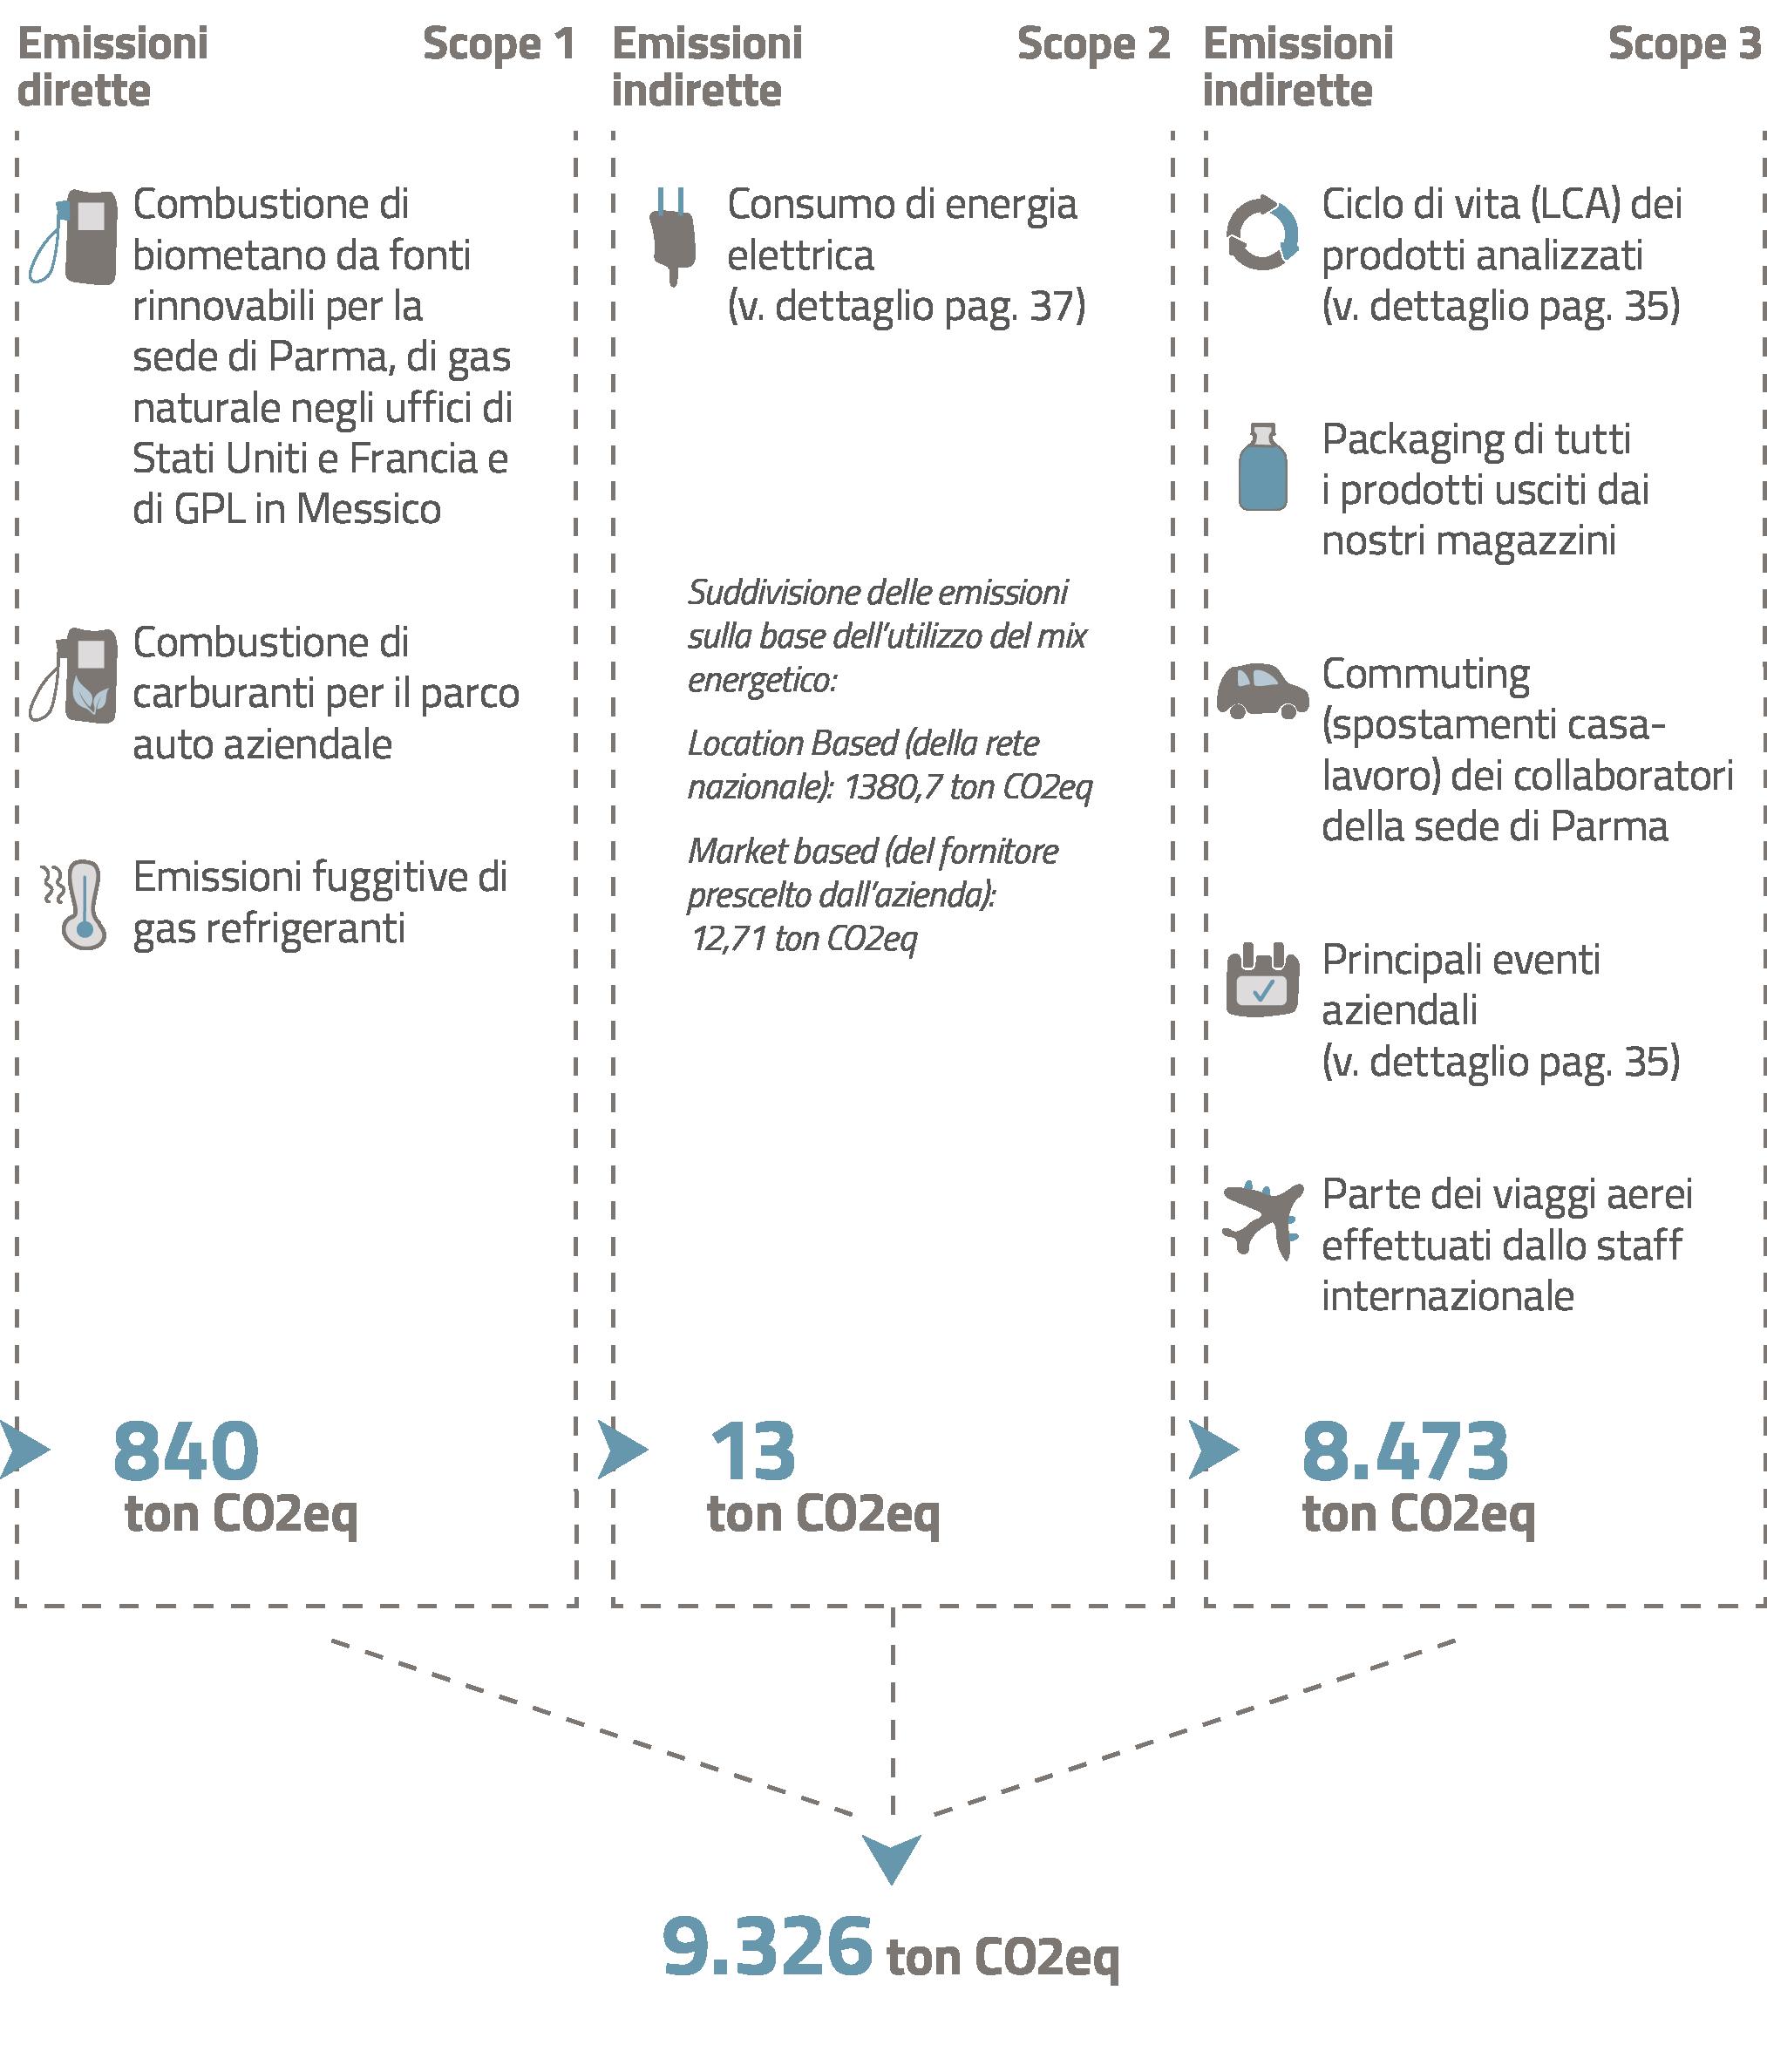 emissioni-co2-grafico